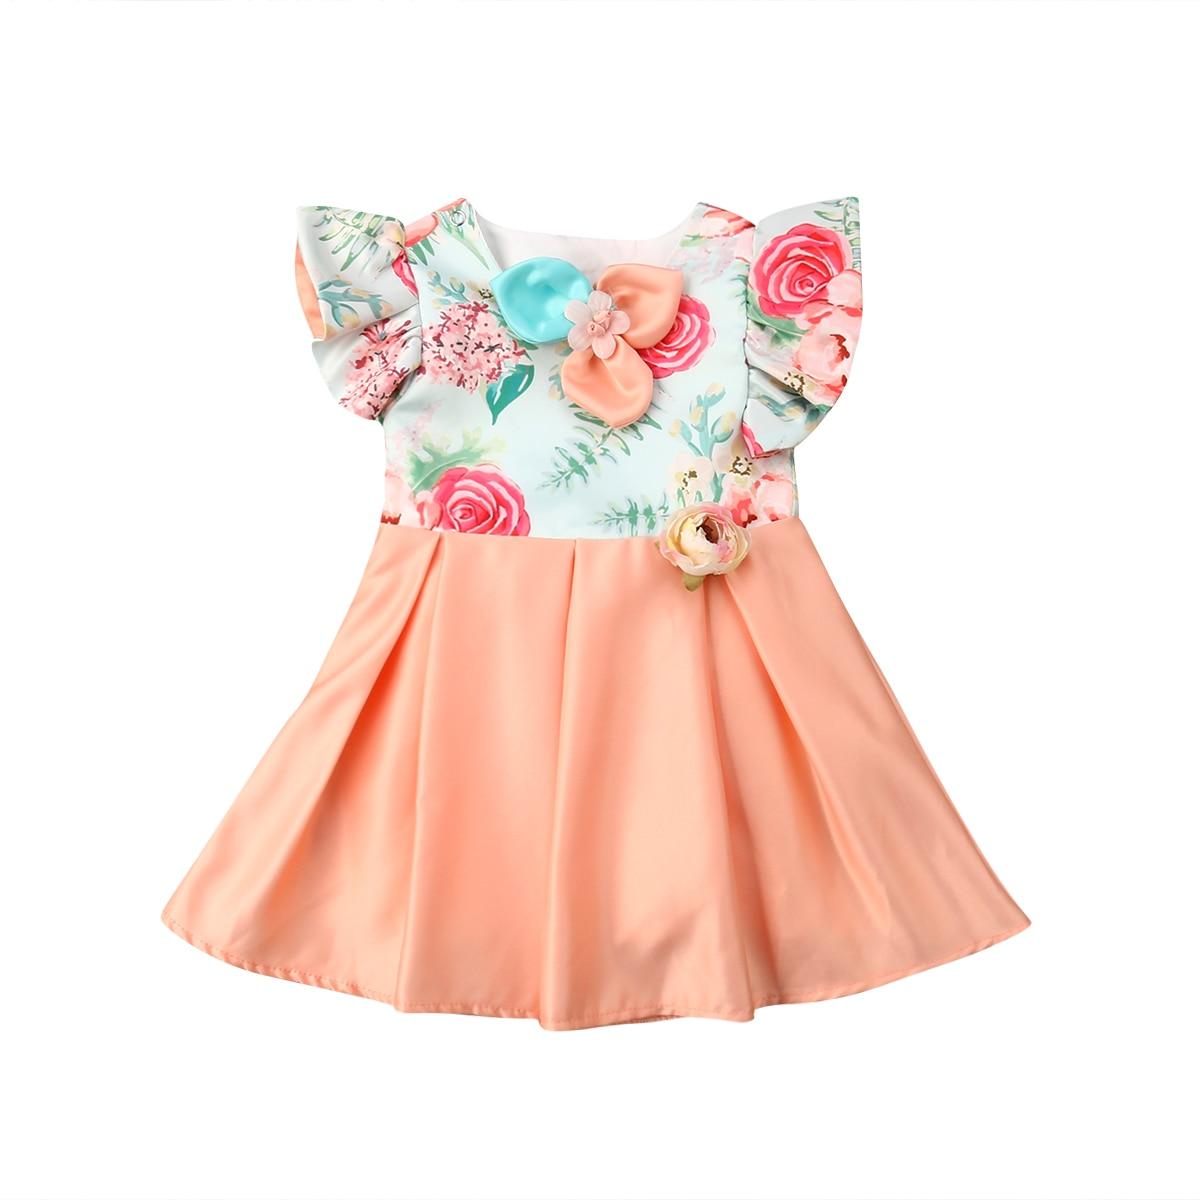 e70cb1697ad8 Dresses for Girls Summer Floral Print Cotton Baby Dress 2019 Lovely ...